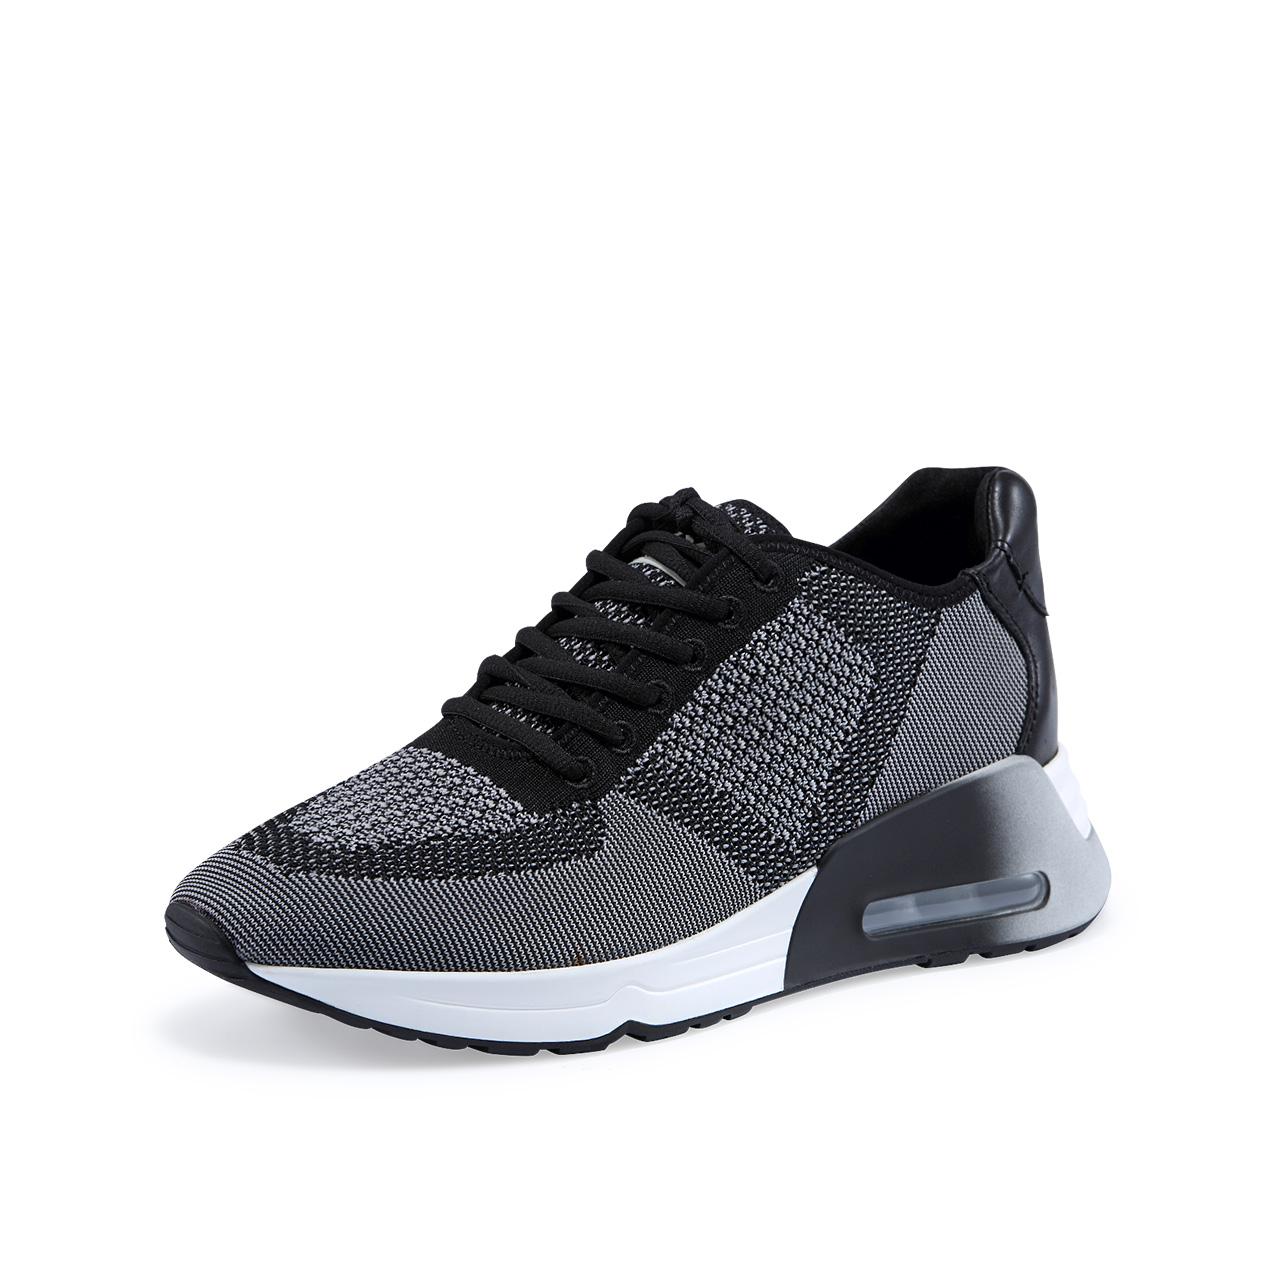 ASH男鞋2018秋季新款LINFORD系列系带气垫底运动休闲单鞋